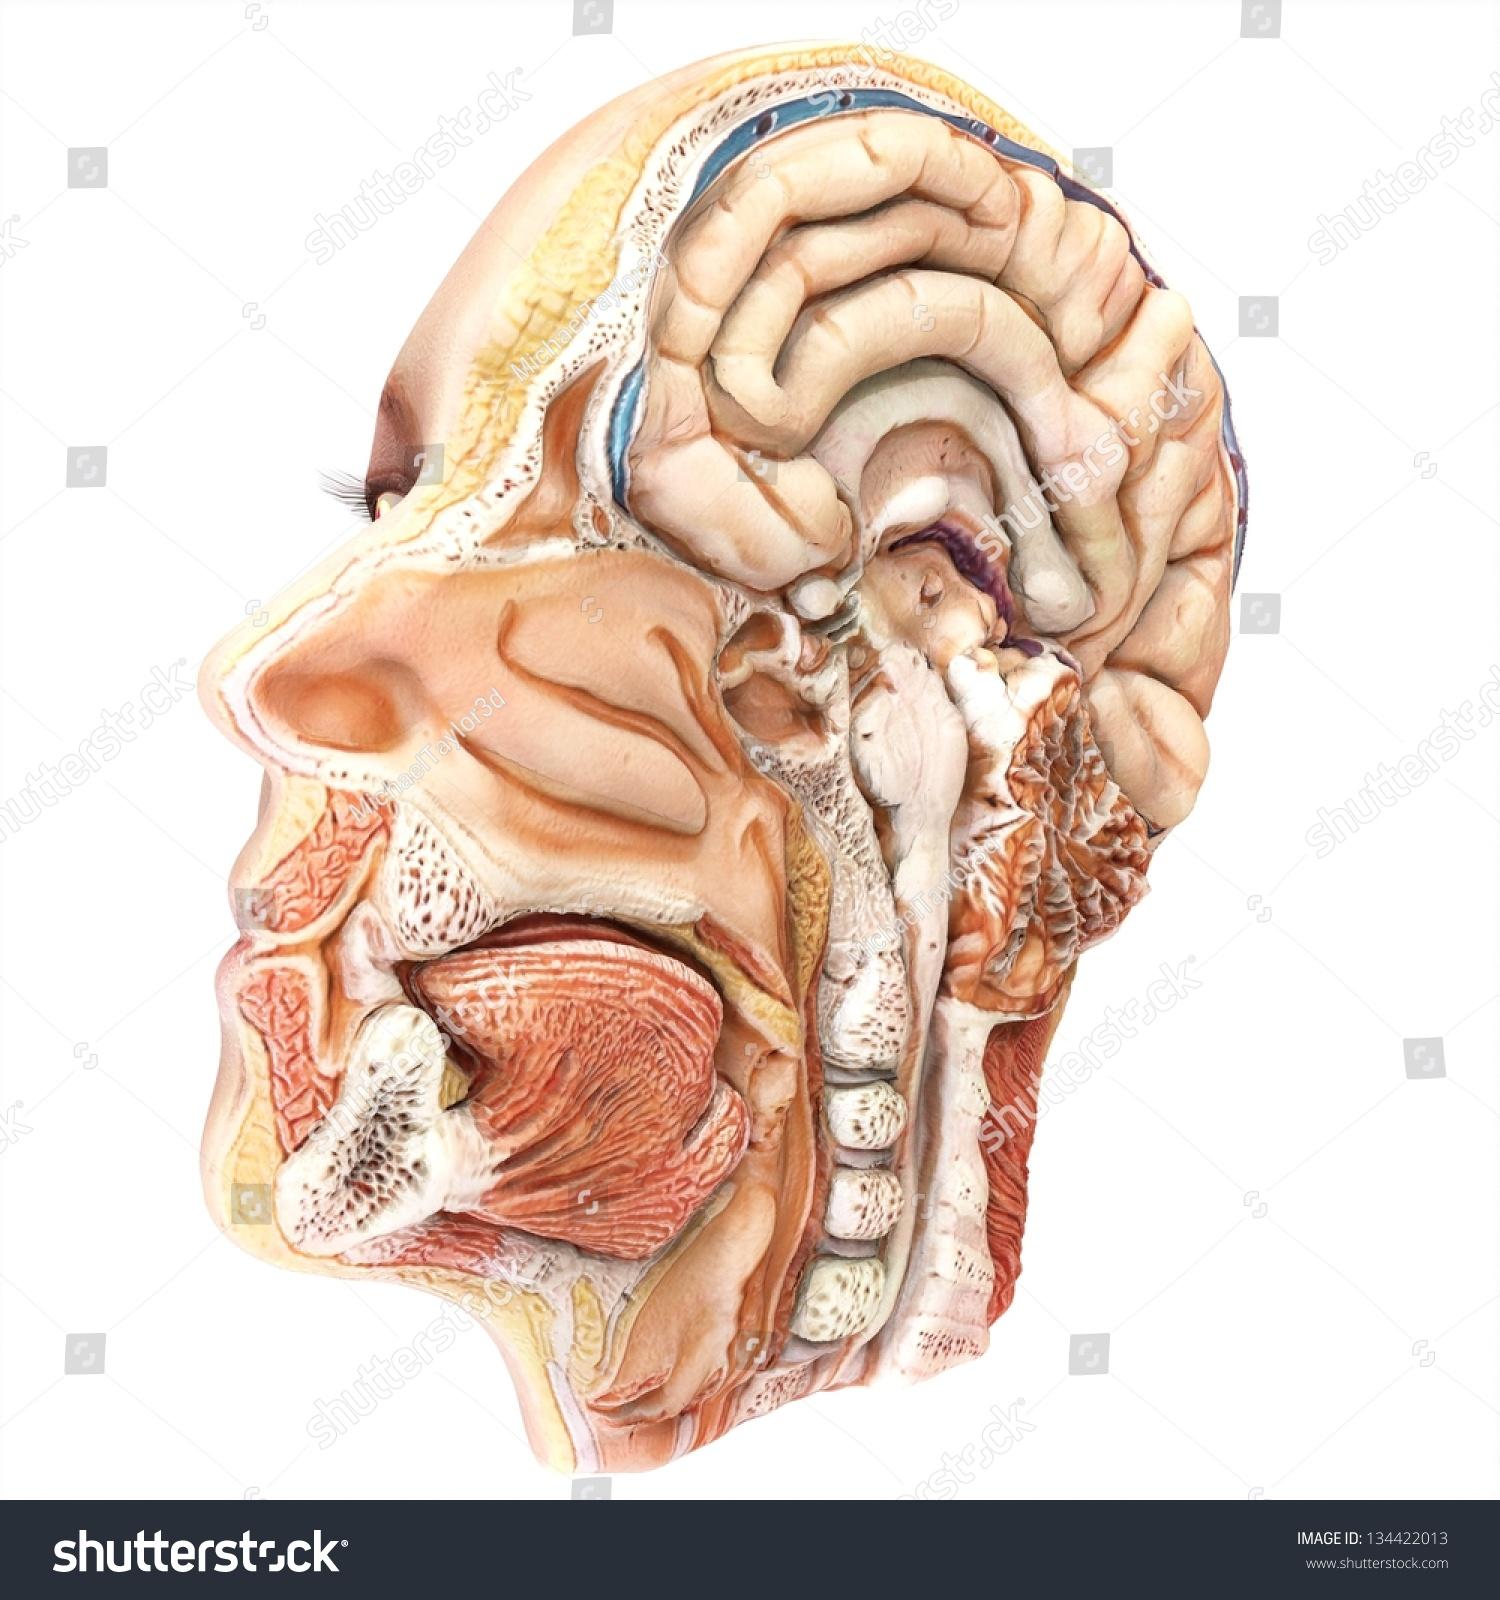 Royalty Free Stock Illustration Of Human Lateral Head Slice Anatomy